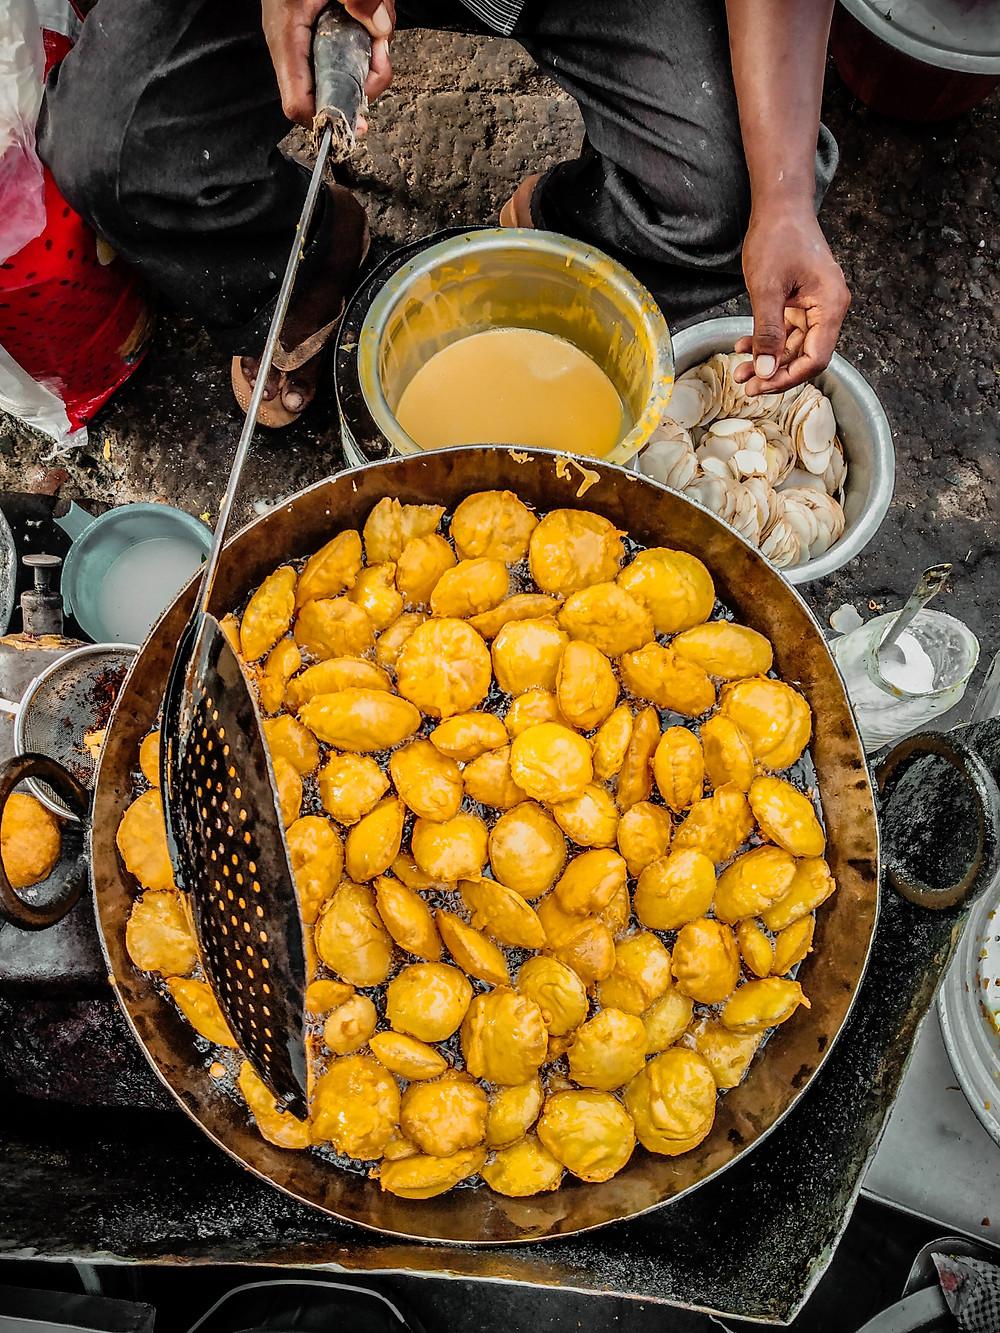 Entrepreneurs in the form of street vendors in Mumbai